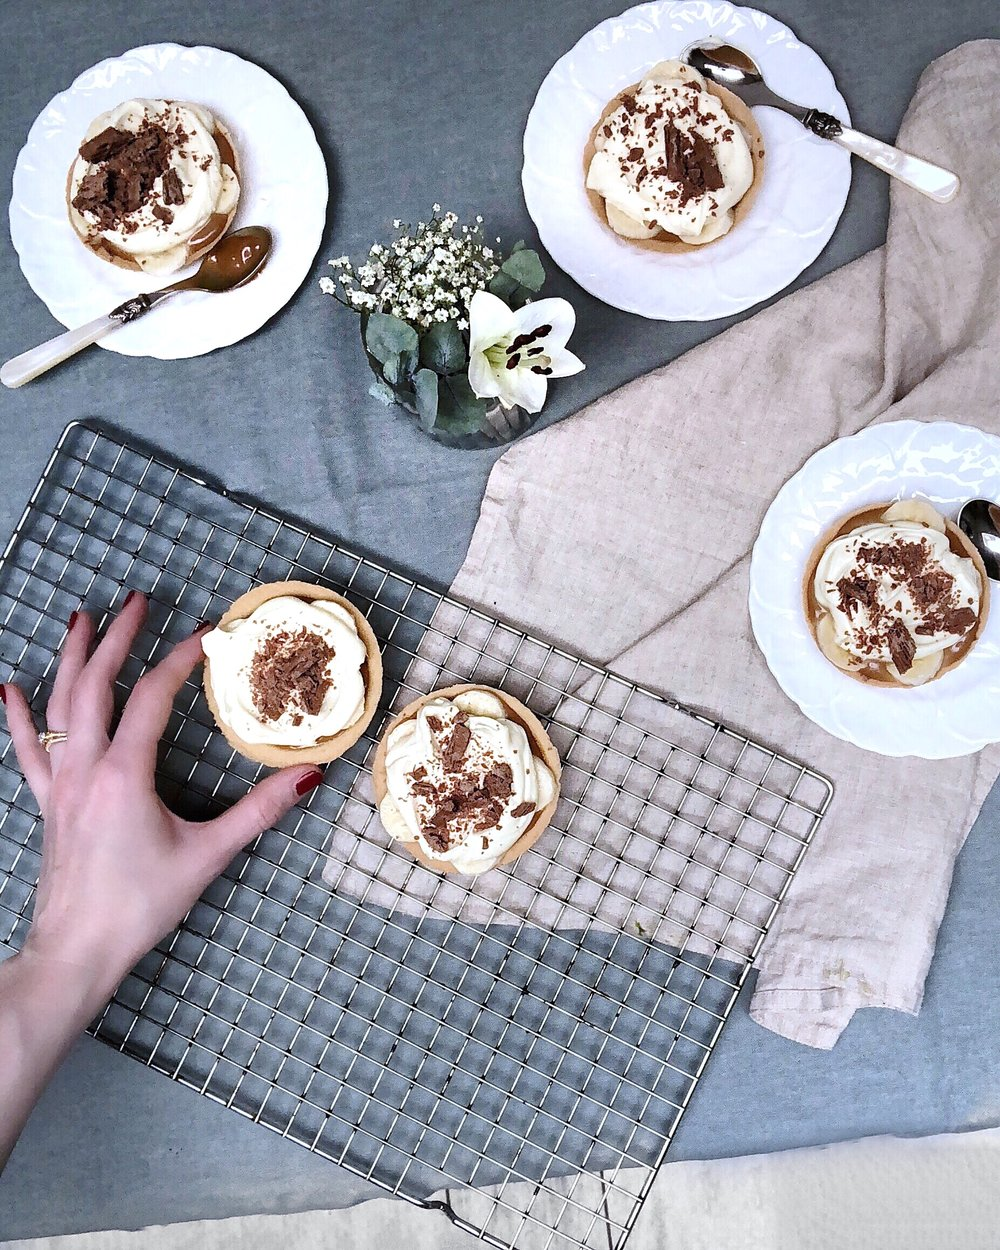 banana pudding with caramel and cream - desert island dishes - Gizzi Erskine - Margie Nomura